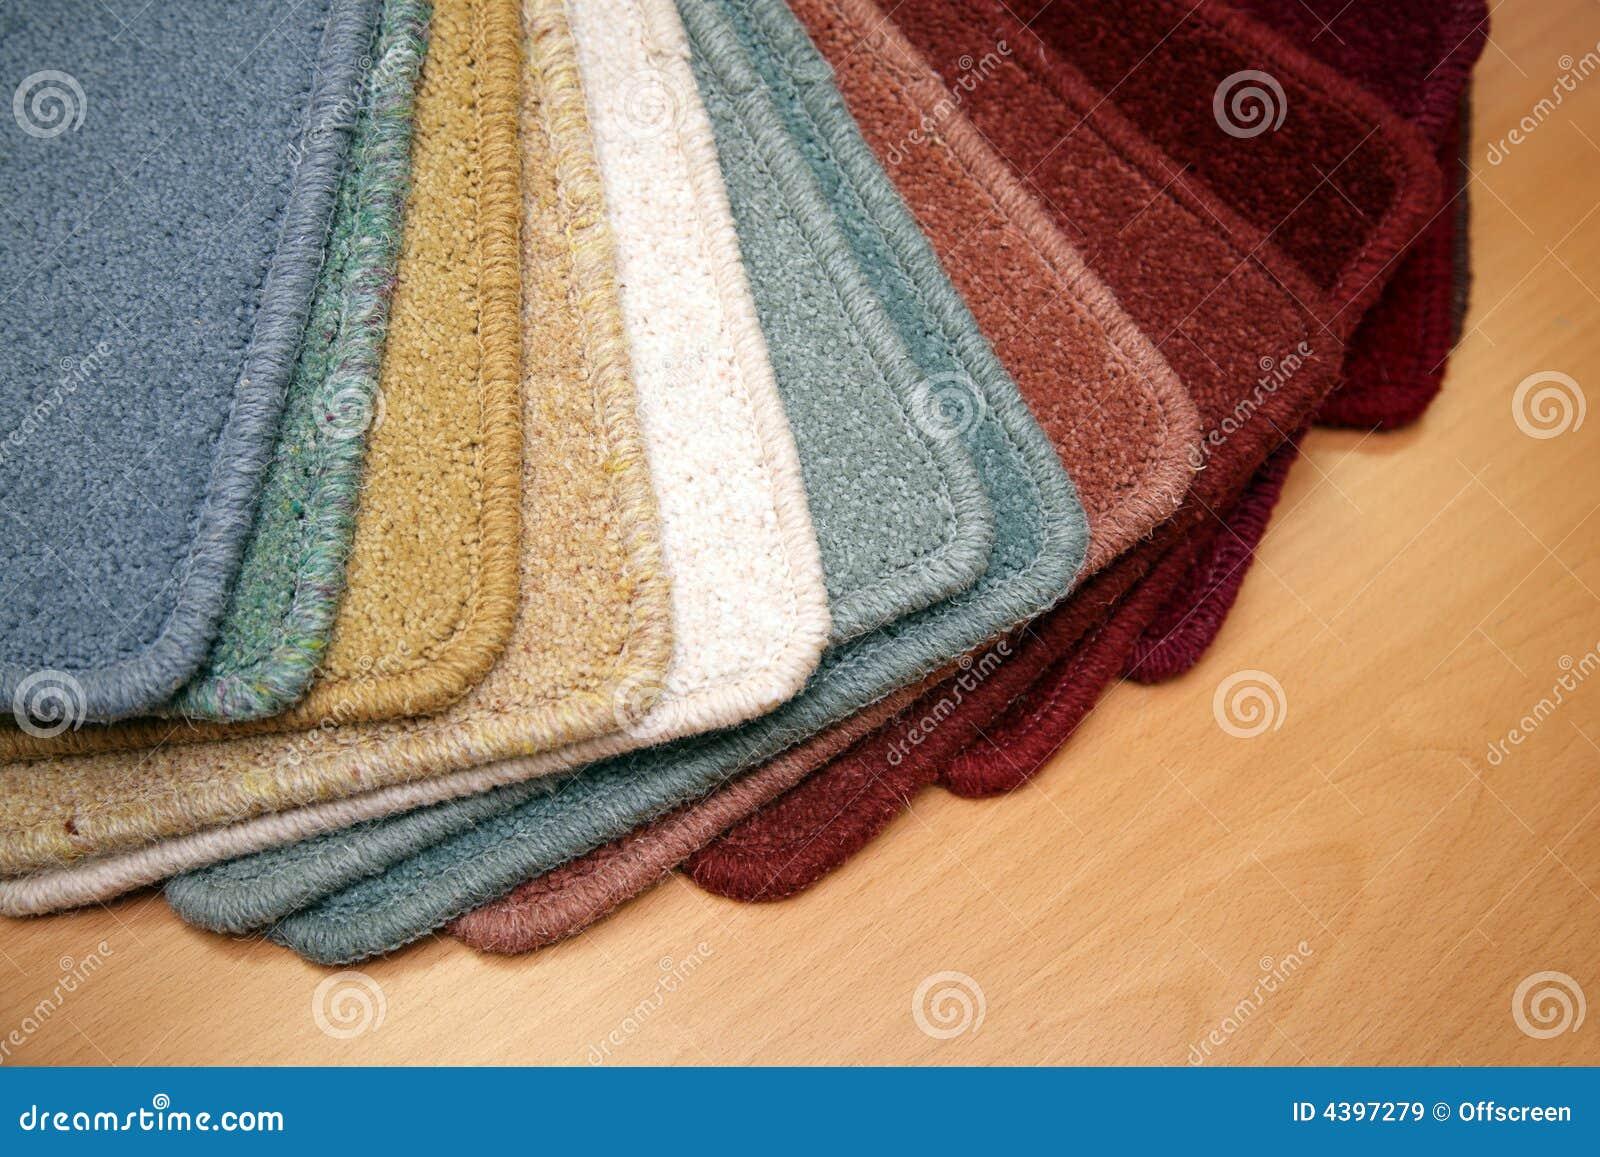 Carpet samples stock image. Image of sale, sample, floor